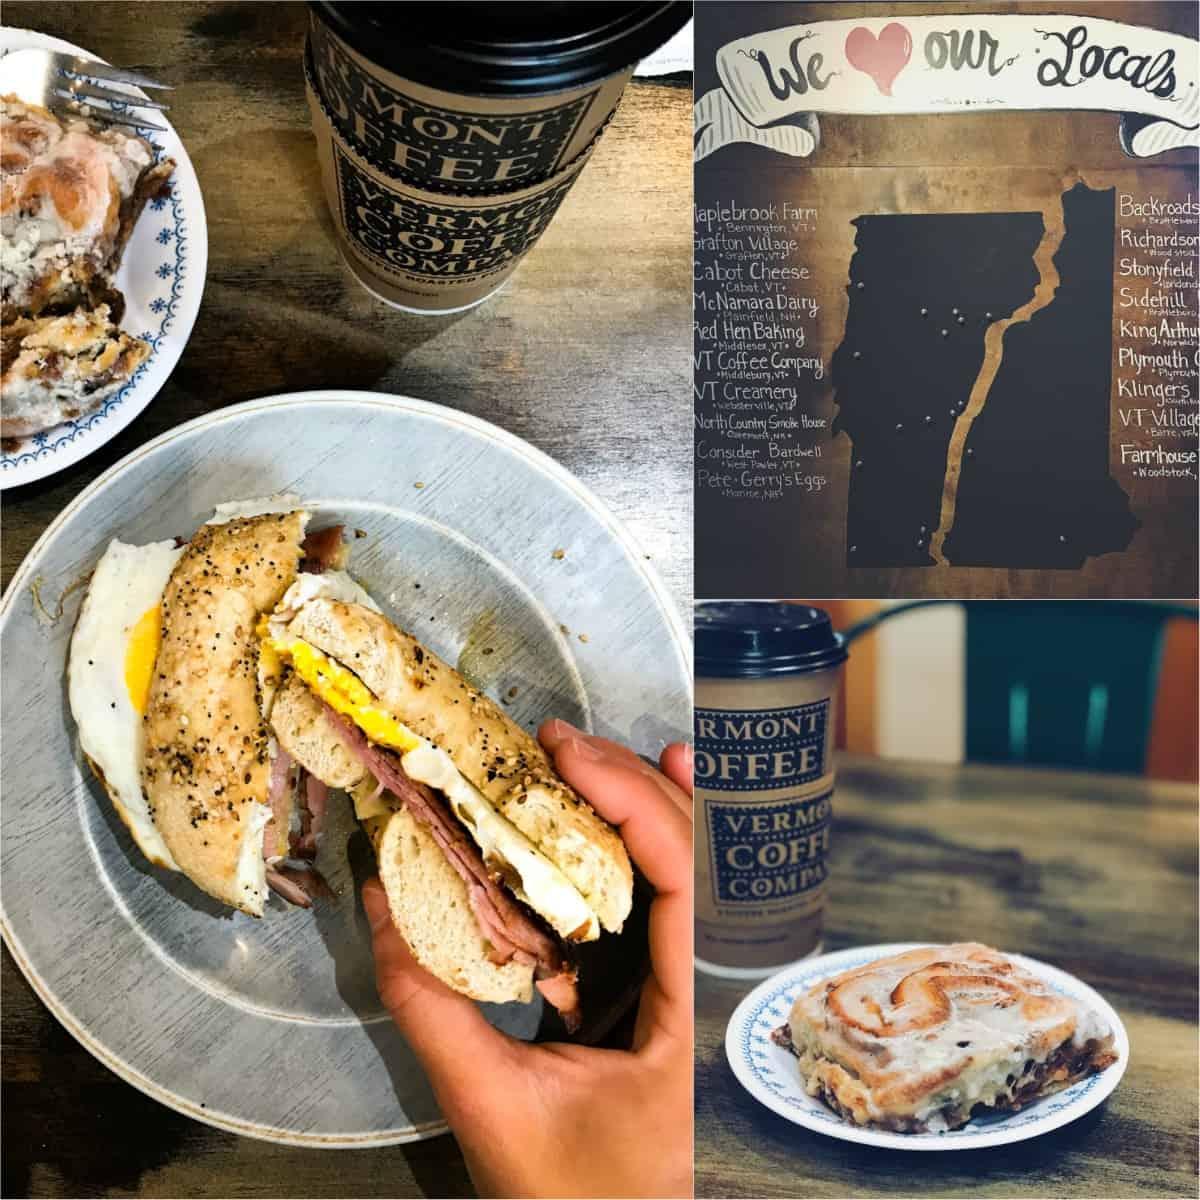 Breakfast at Mon Vert Cafe in Woodstock, VT